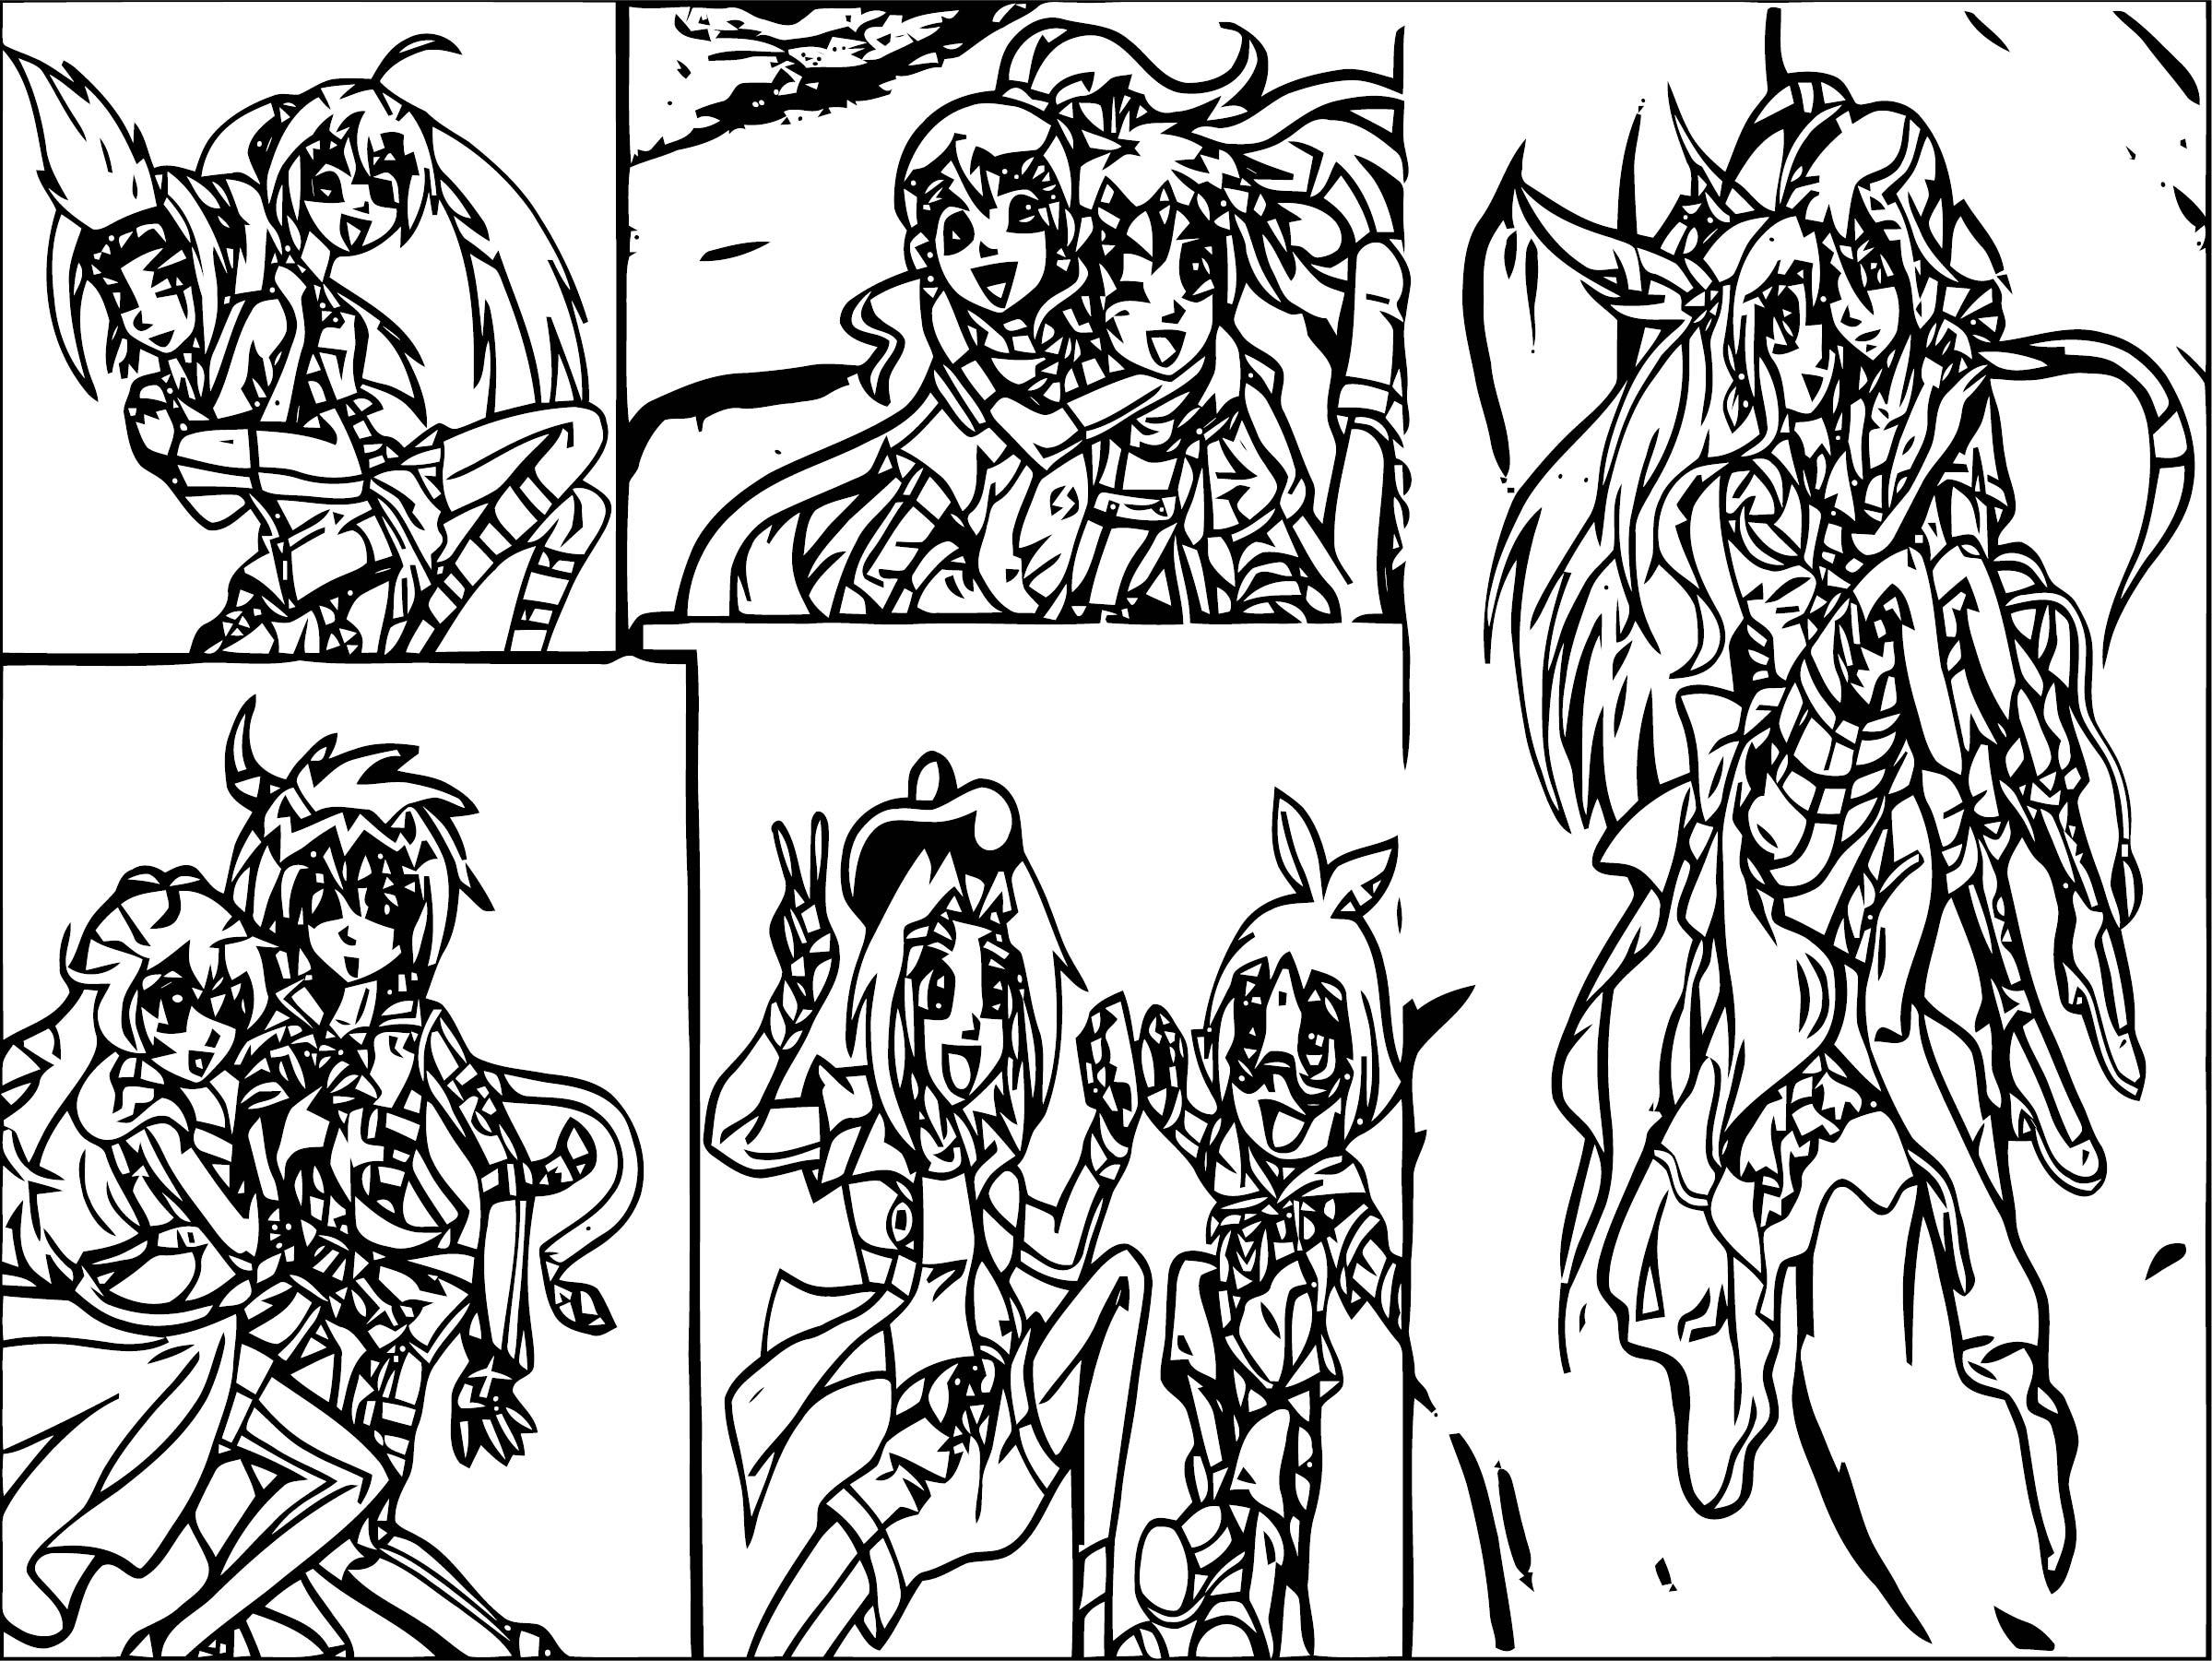 Brawlers And Bakugan Bakugan Battle Brawlers Coloring Page